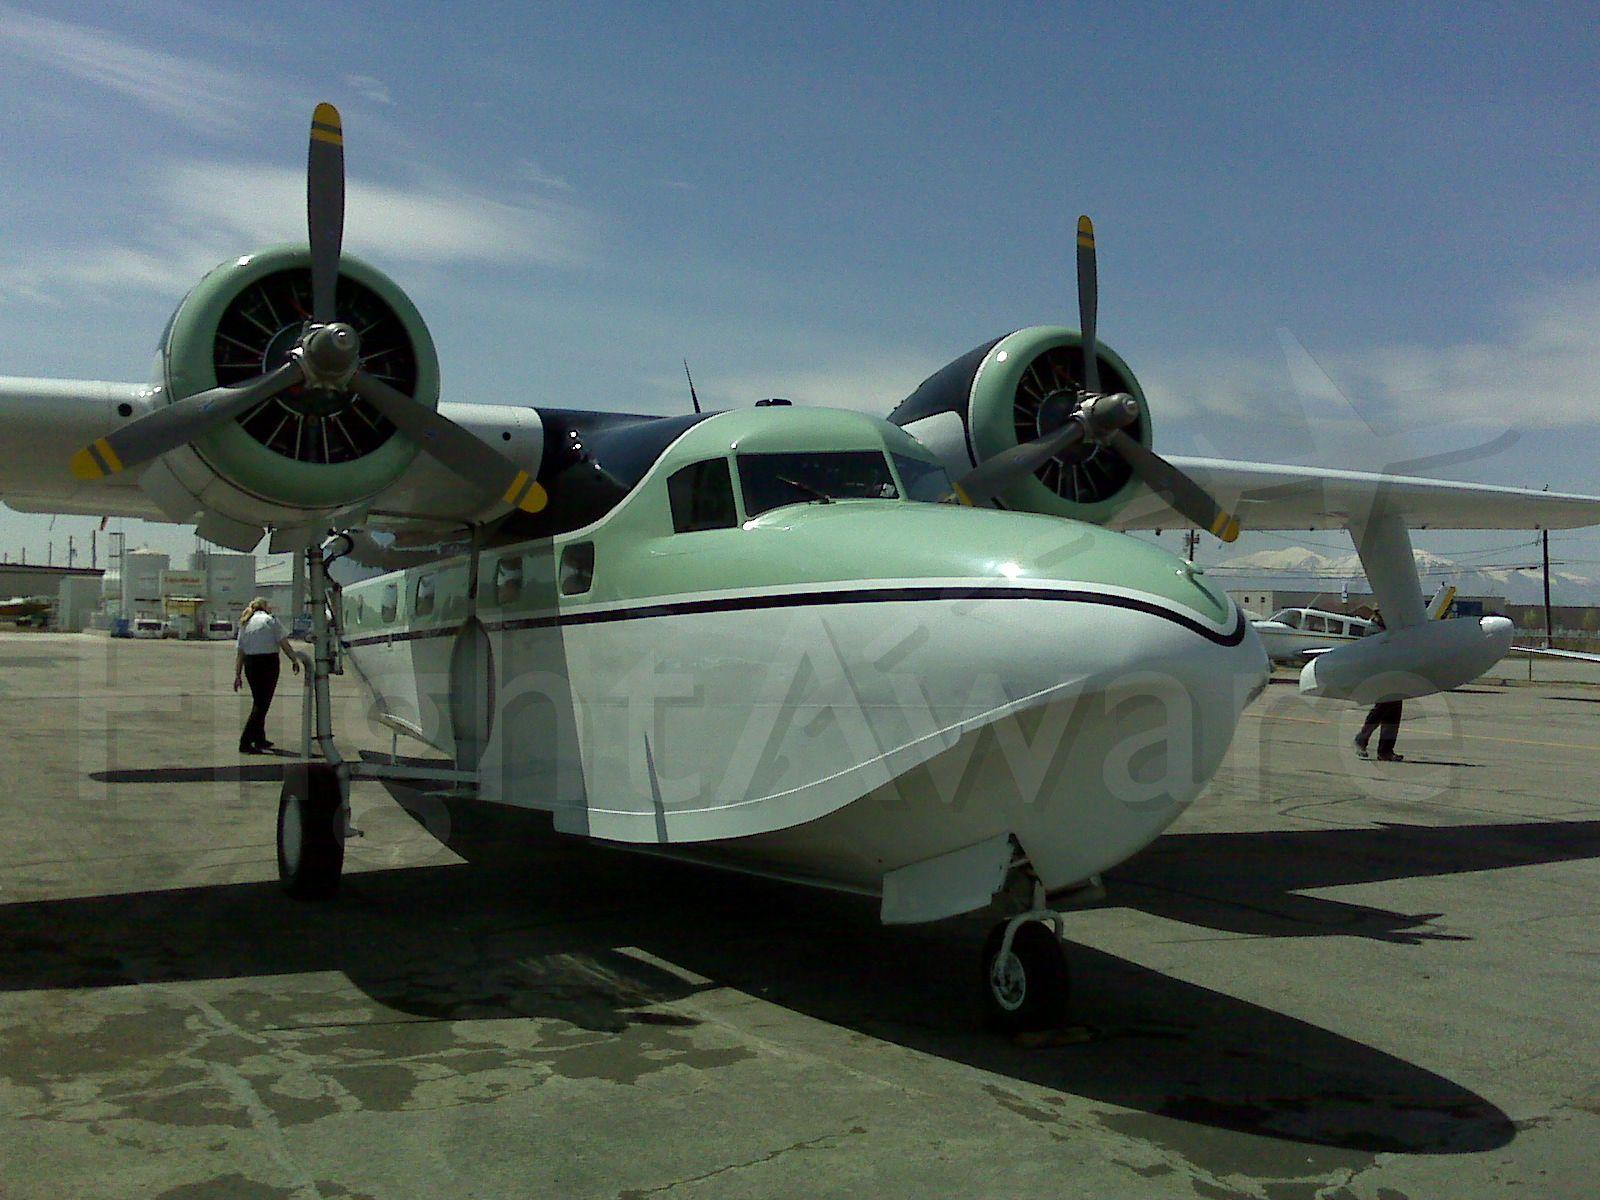 Grumman G-73 Mallard (N168WS) - Grumman Mallard